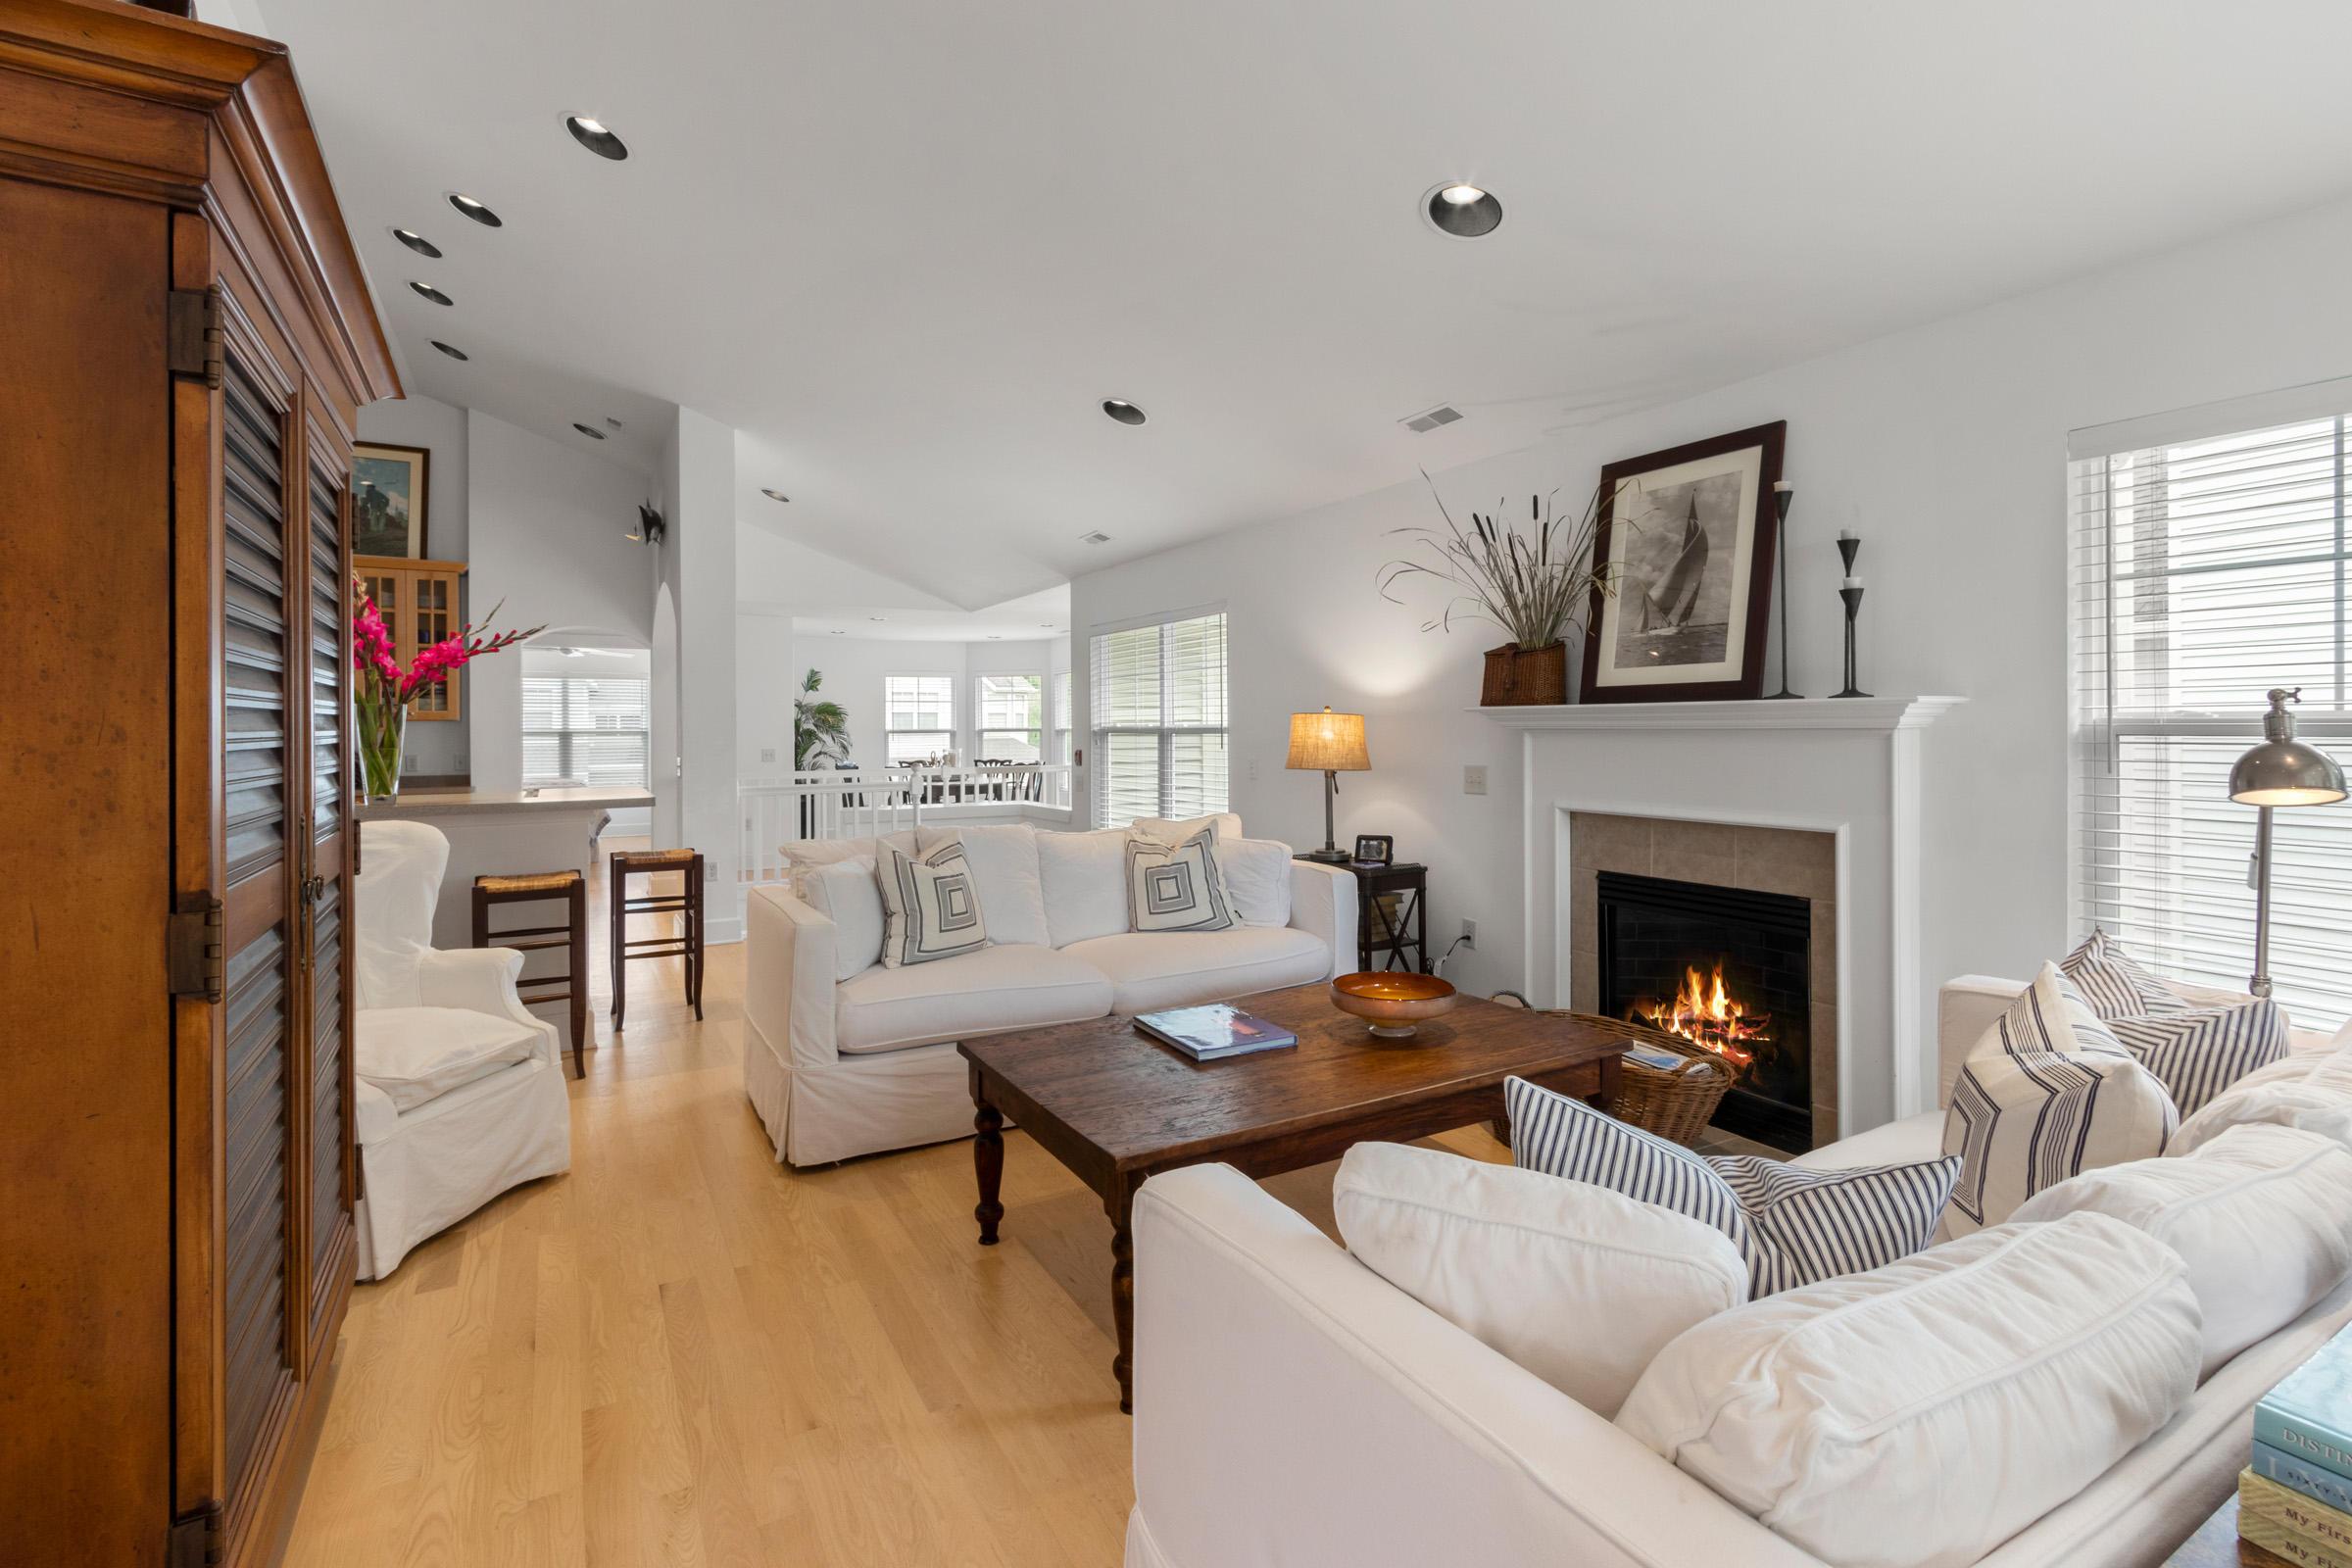 402 Abbey Ridge Ct, Fontana, Wisconsin 53125, 3 Bedrooms Bedrooms, 7 Rooms Rooms,2 BathroomsBathrooms,Condominiums,For Sale,Abbey Ridge Ct,2,1676893